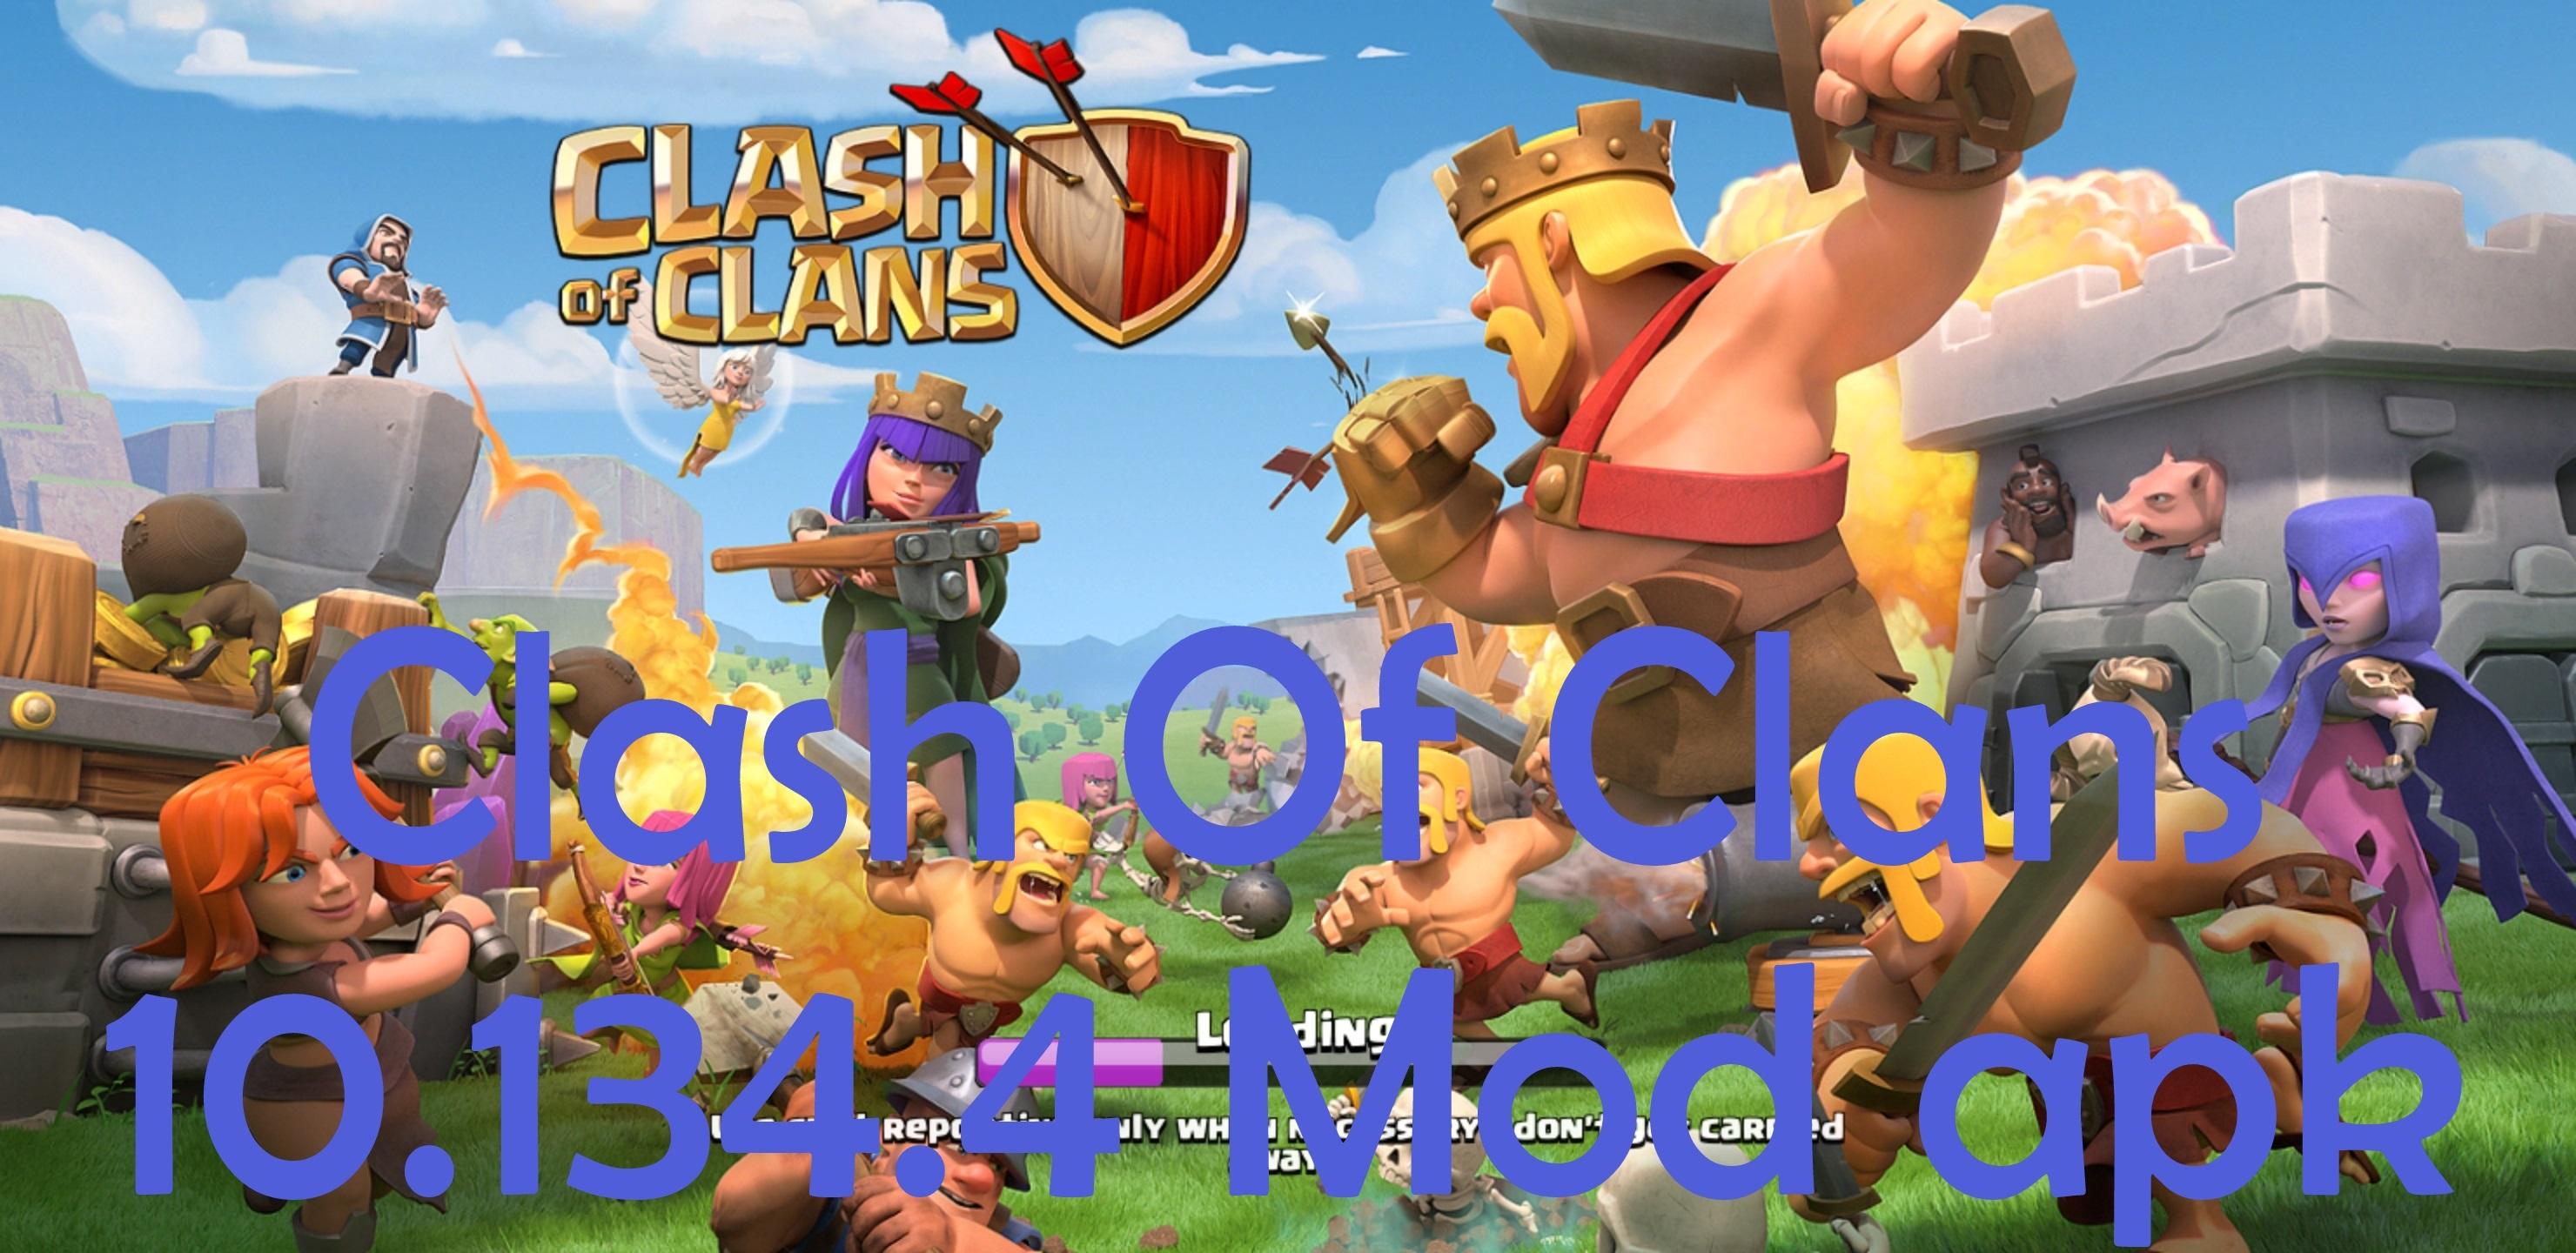 Clash Of Clans 10 134 6 Mod Apk